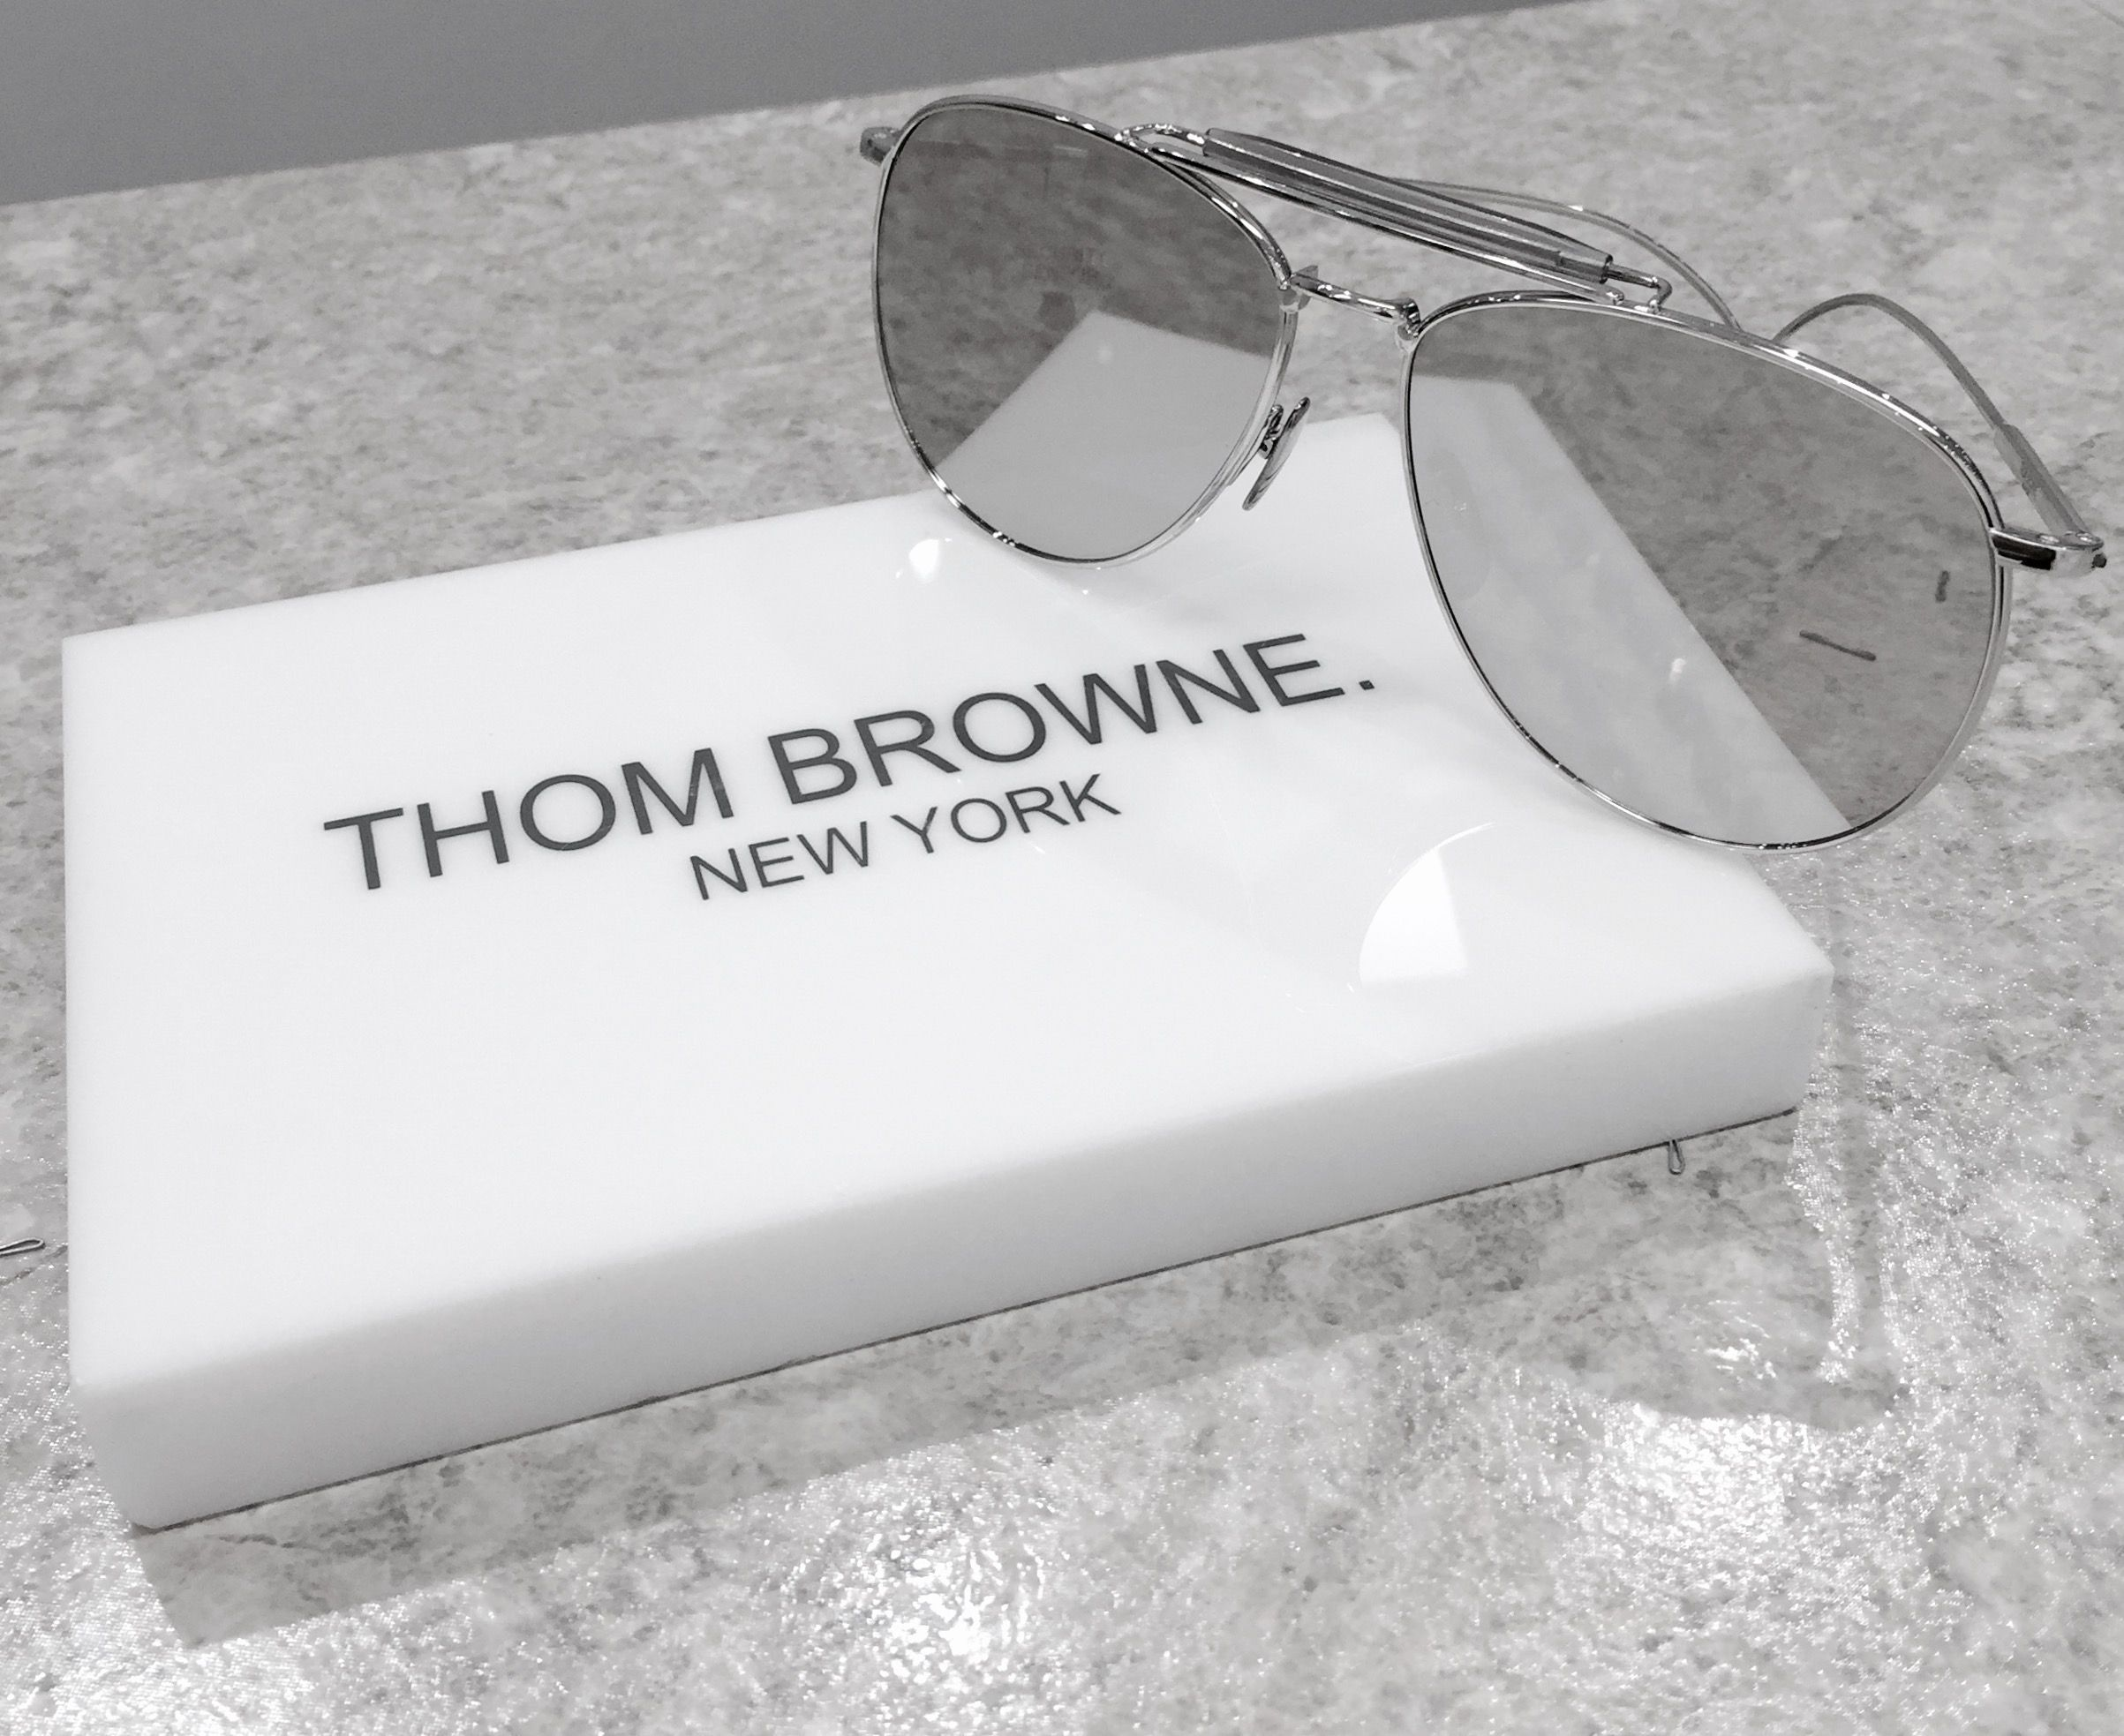 Classic #ThomBrowne style. #sunnies #charlottejonesopticians #CJO